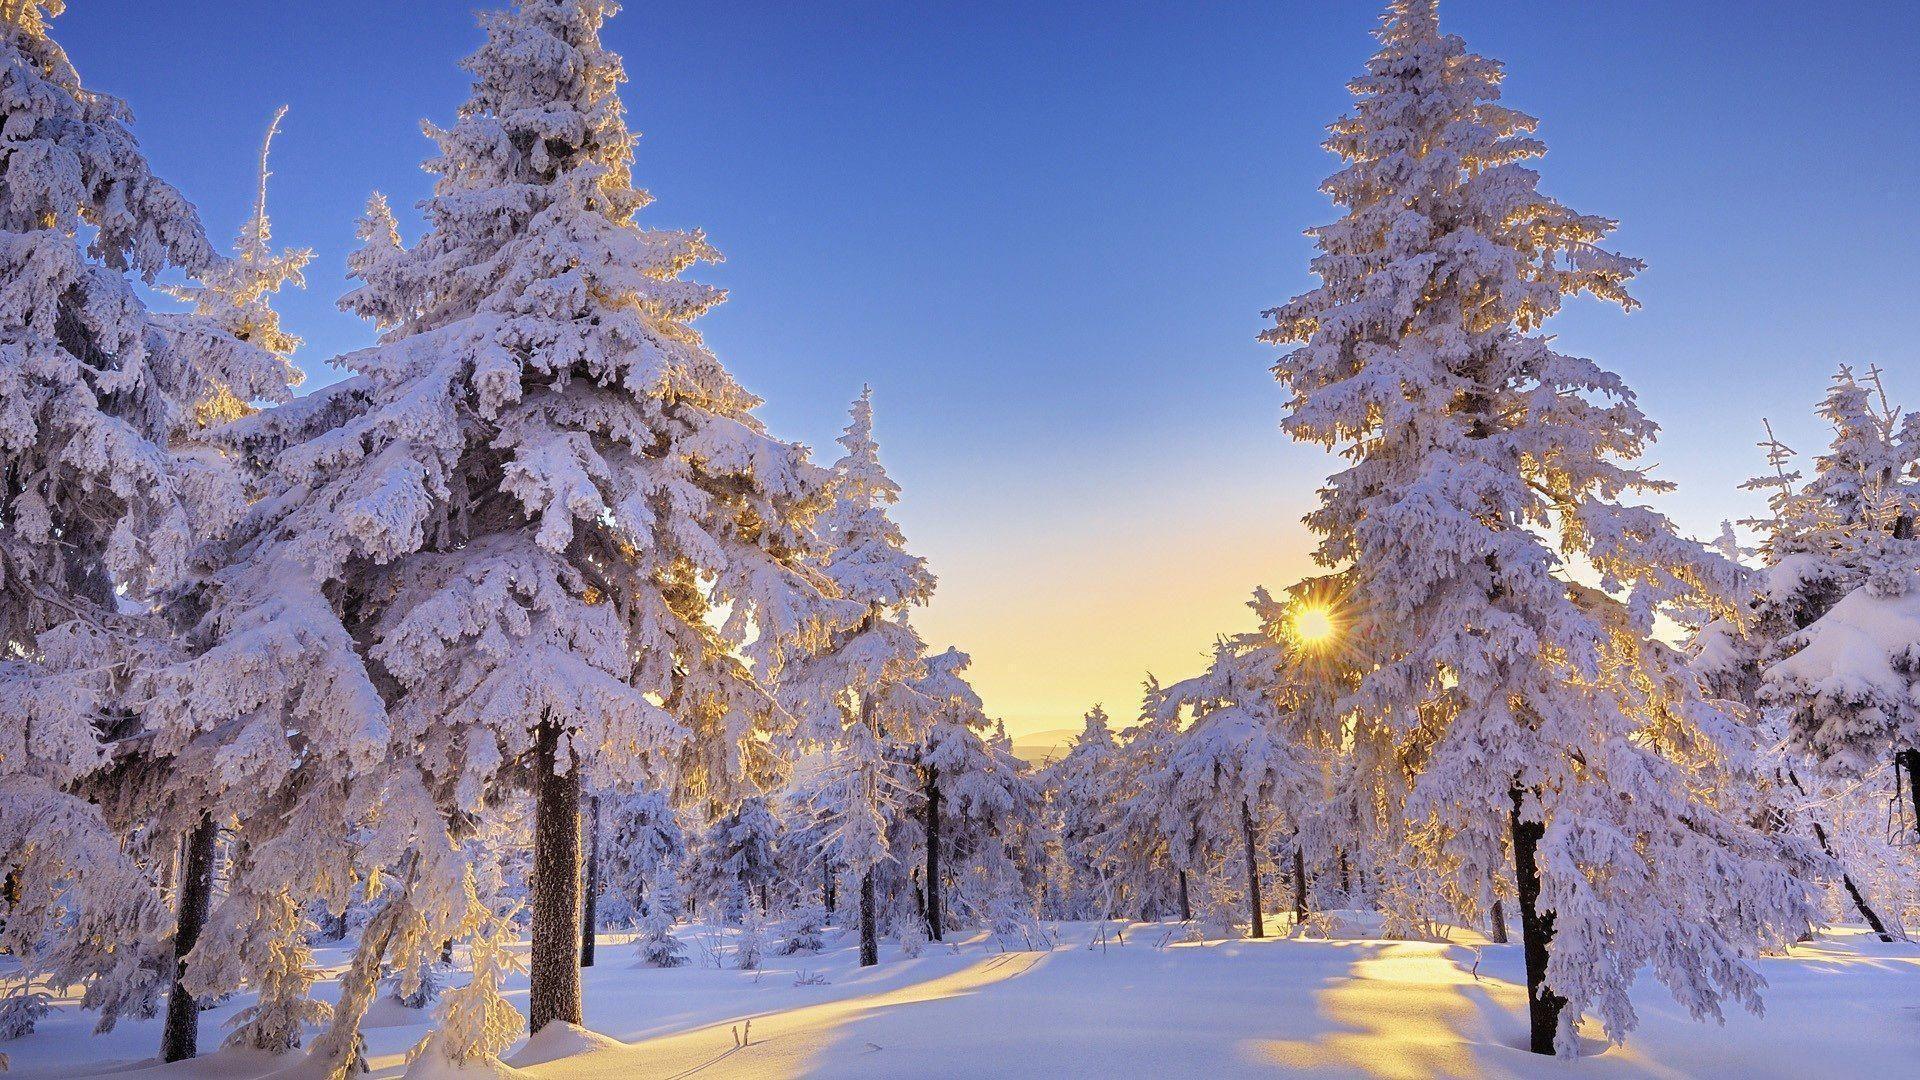 Winter Wonderland Wallpapers For Desktop Imageswall Winter Pictures Winter Wallpaper Winter Landscape